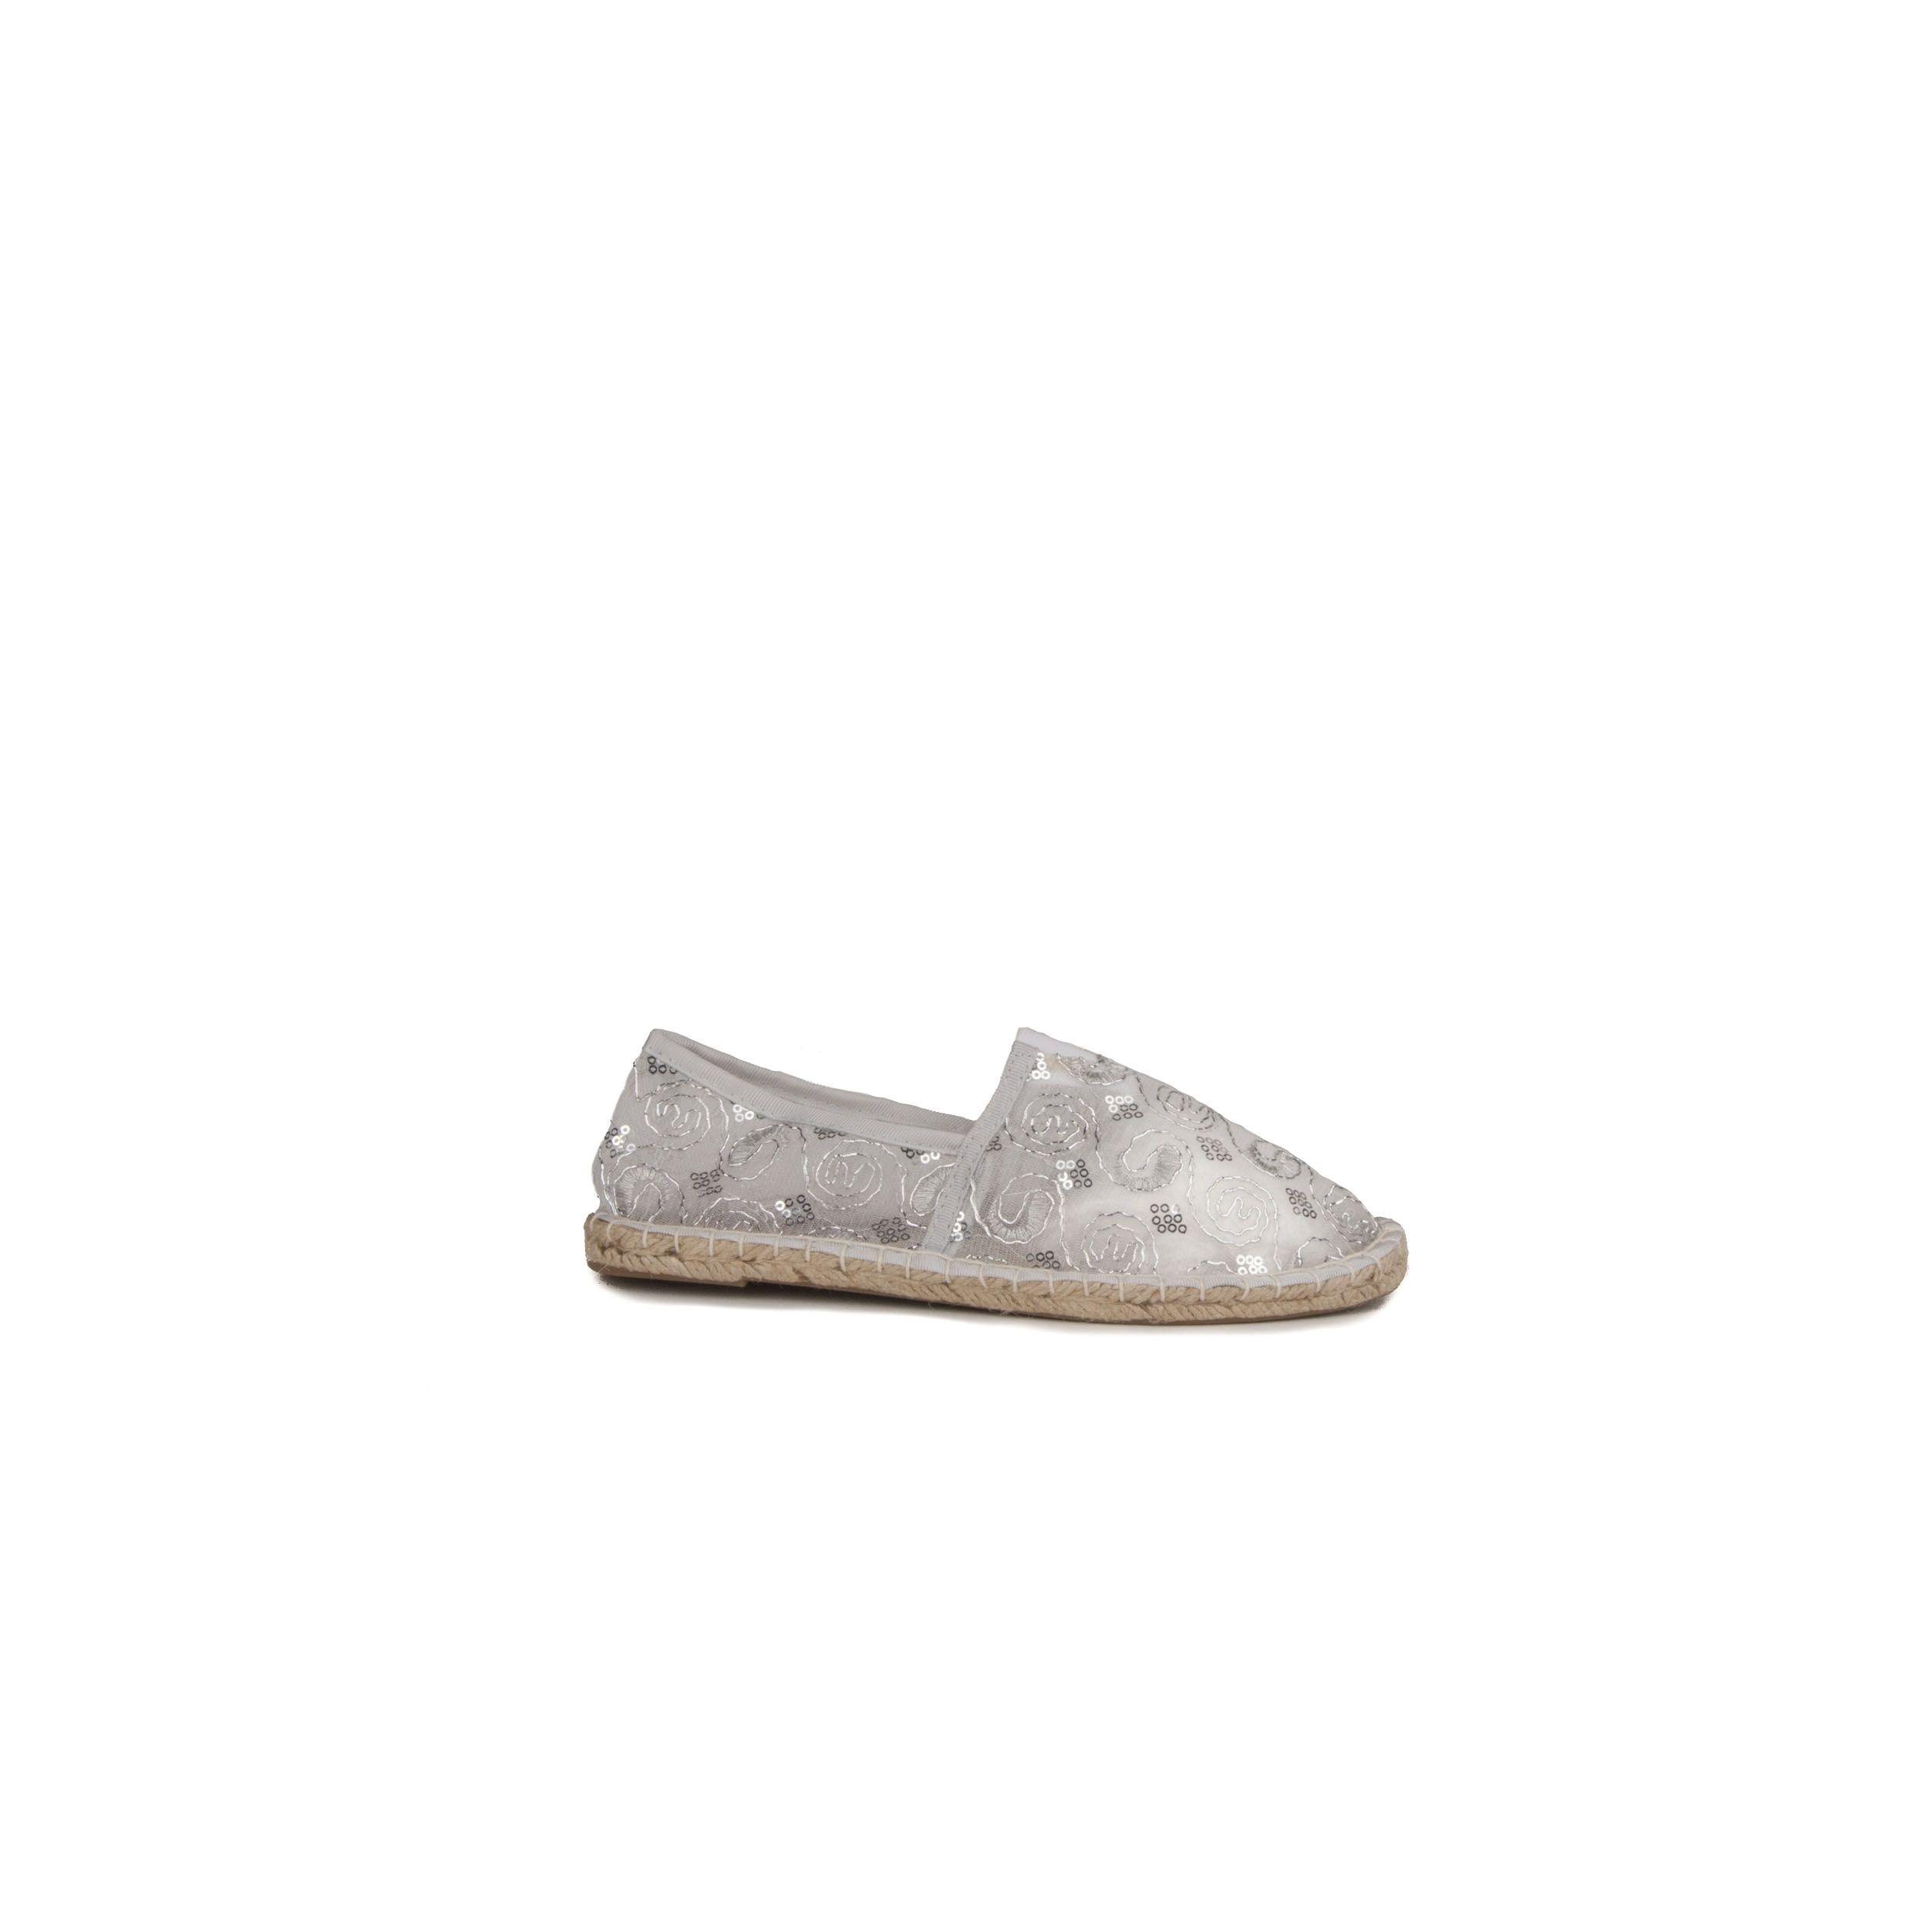 Montevita Artisanal Espadrille in Silver